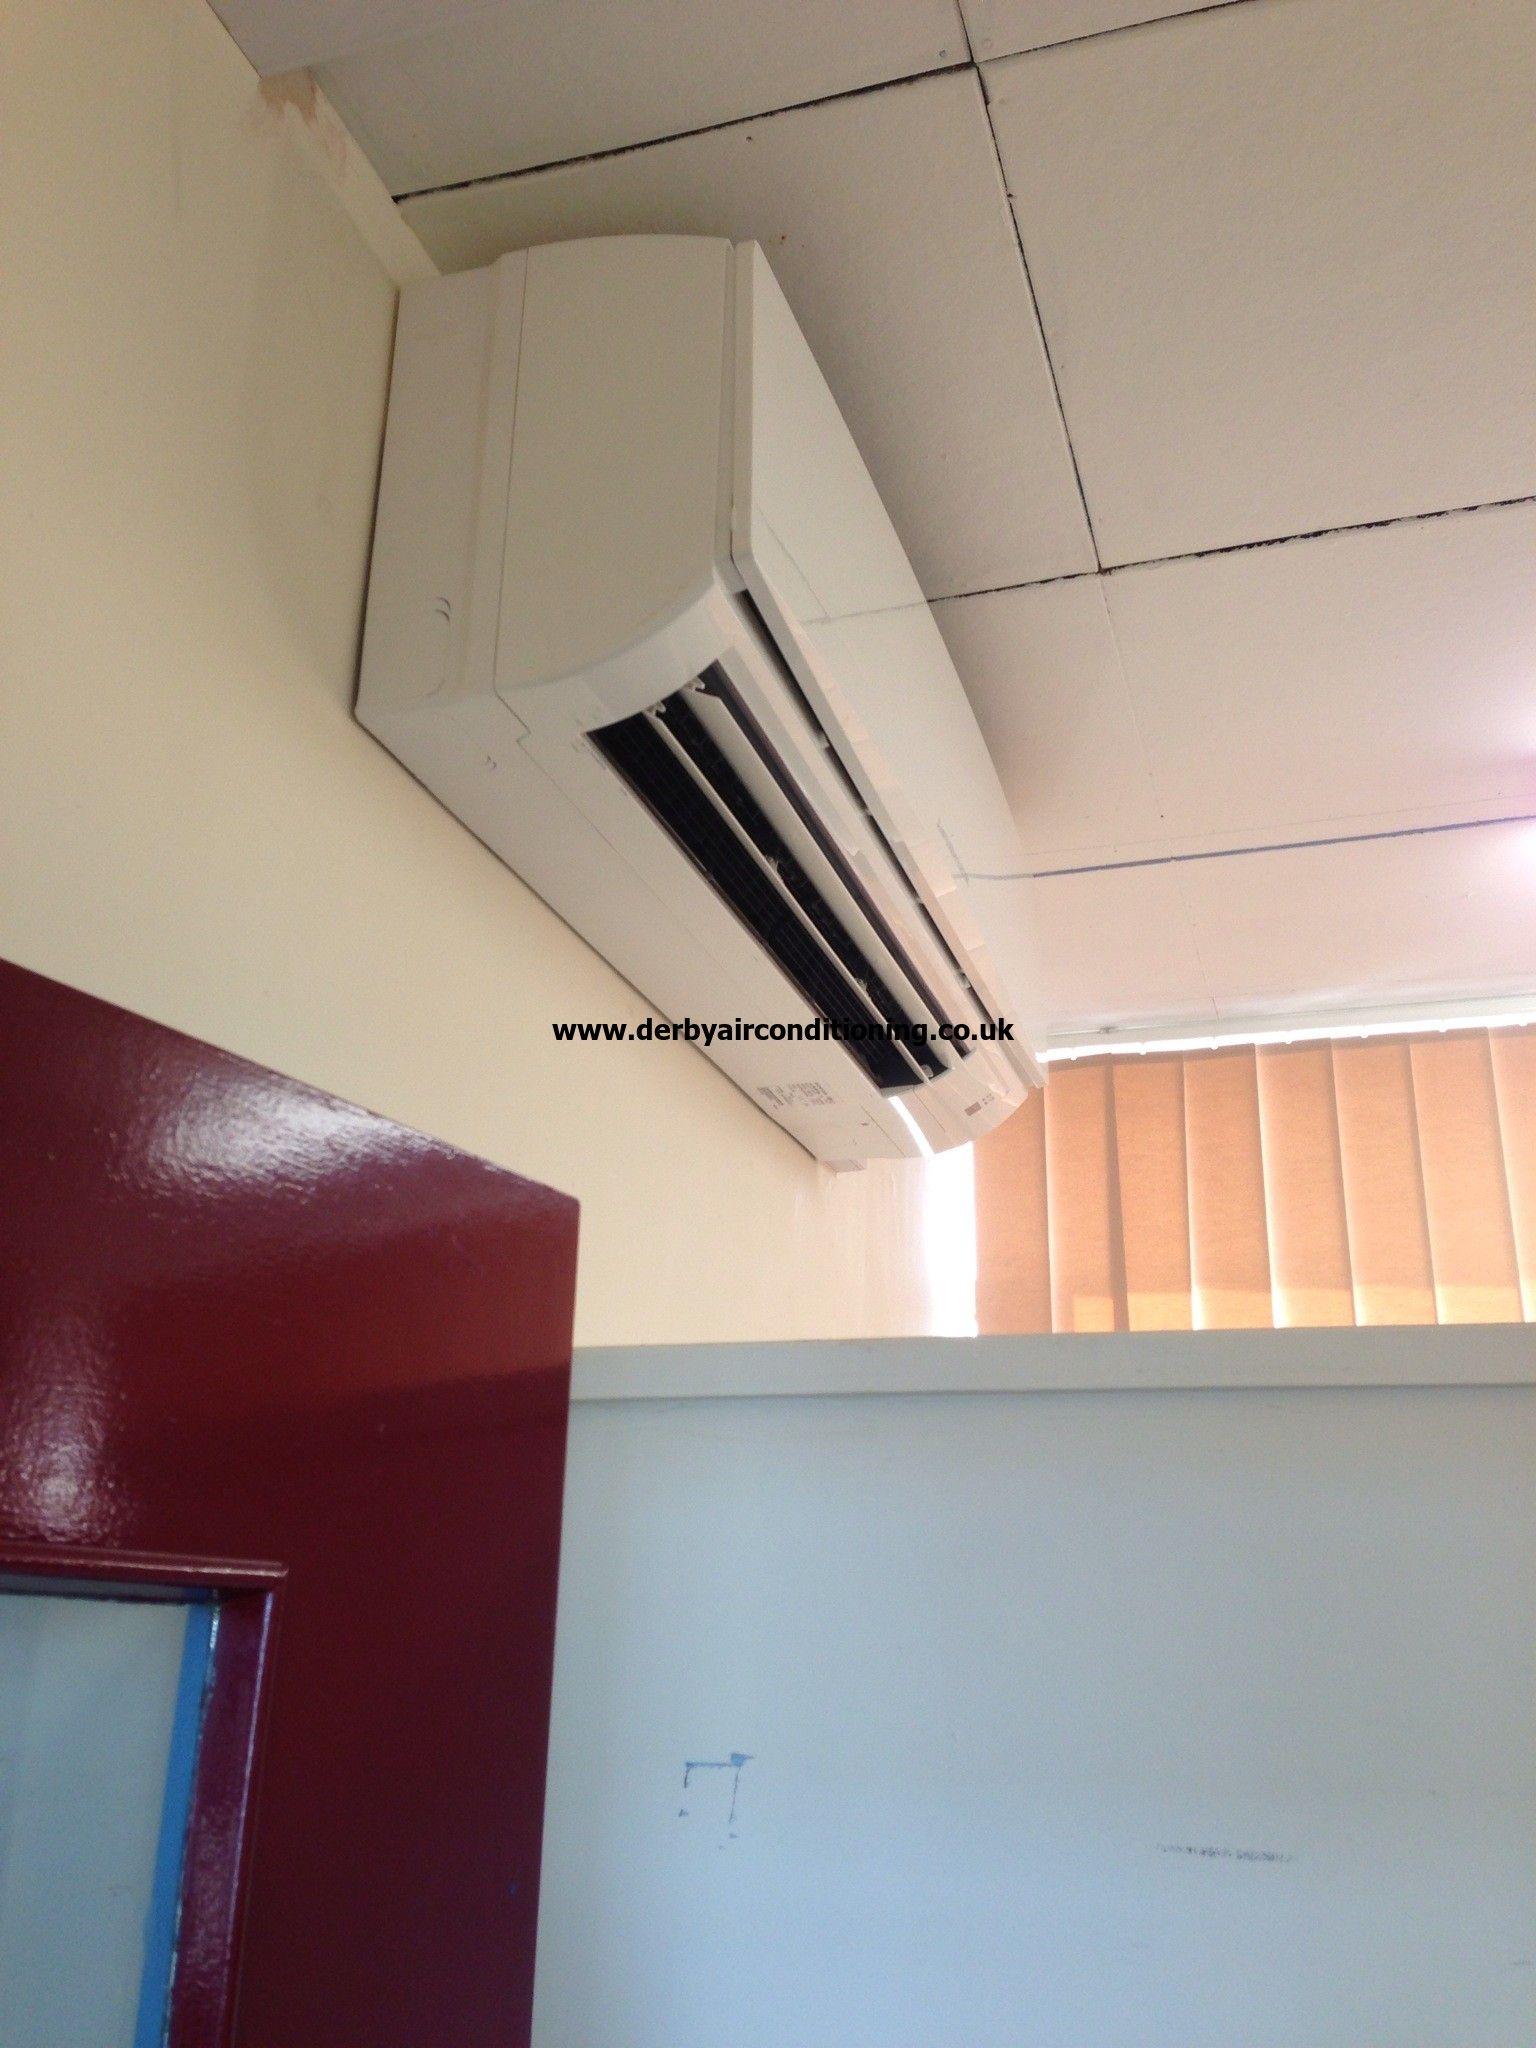 Mitsubishi Electric PKARP71 7kW Power Inverter wall